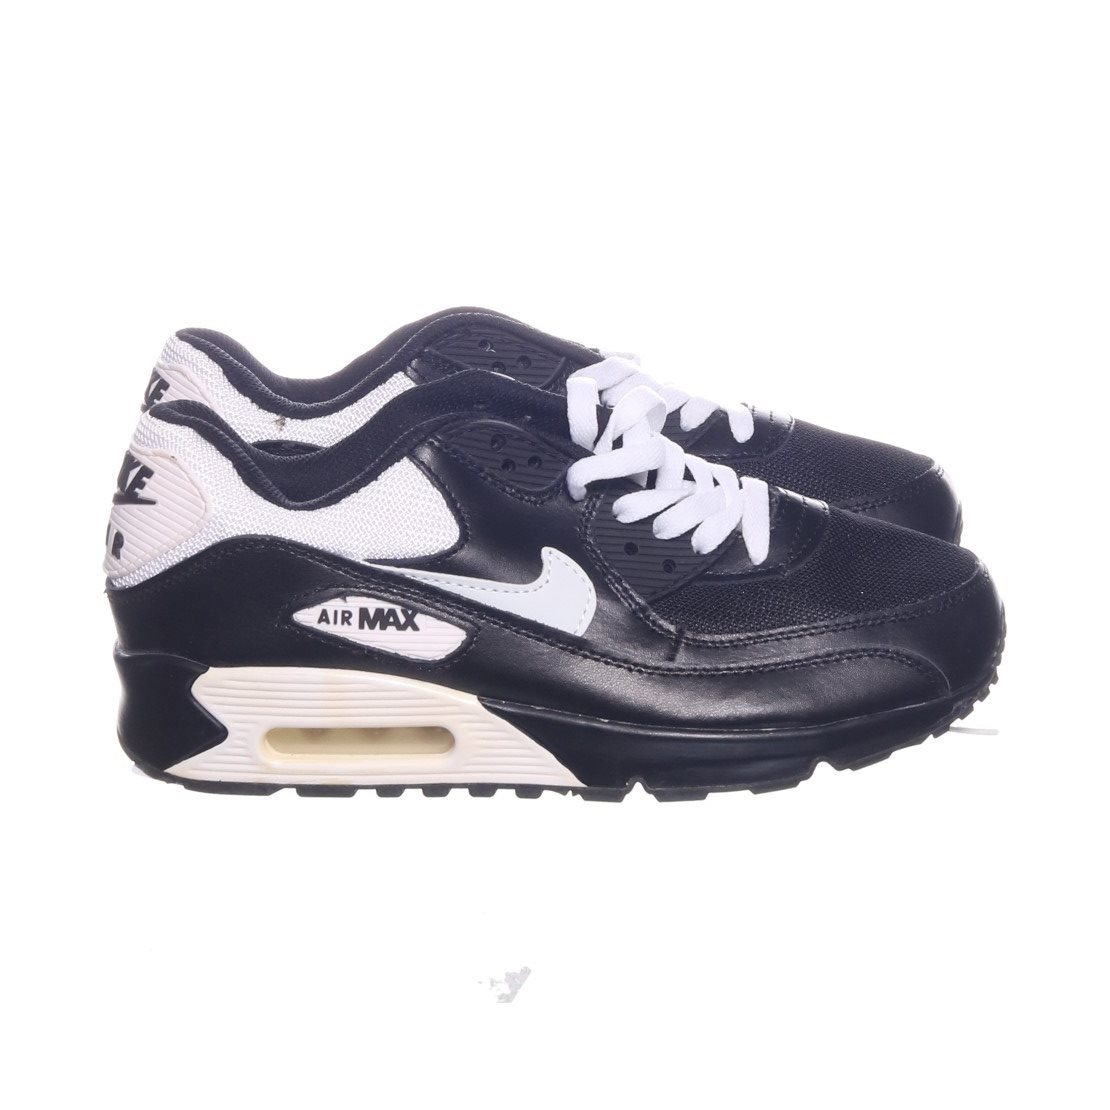 the best attitude f48cd e9ad1 Nike, Sneakers, Strl  42, Nike Air Max, Svart Vit